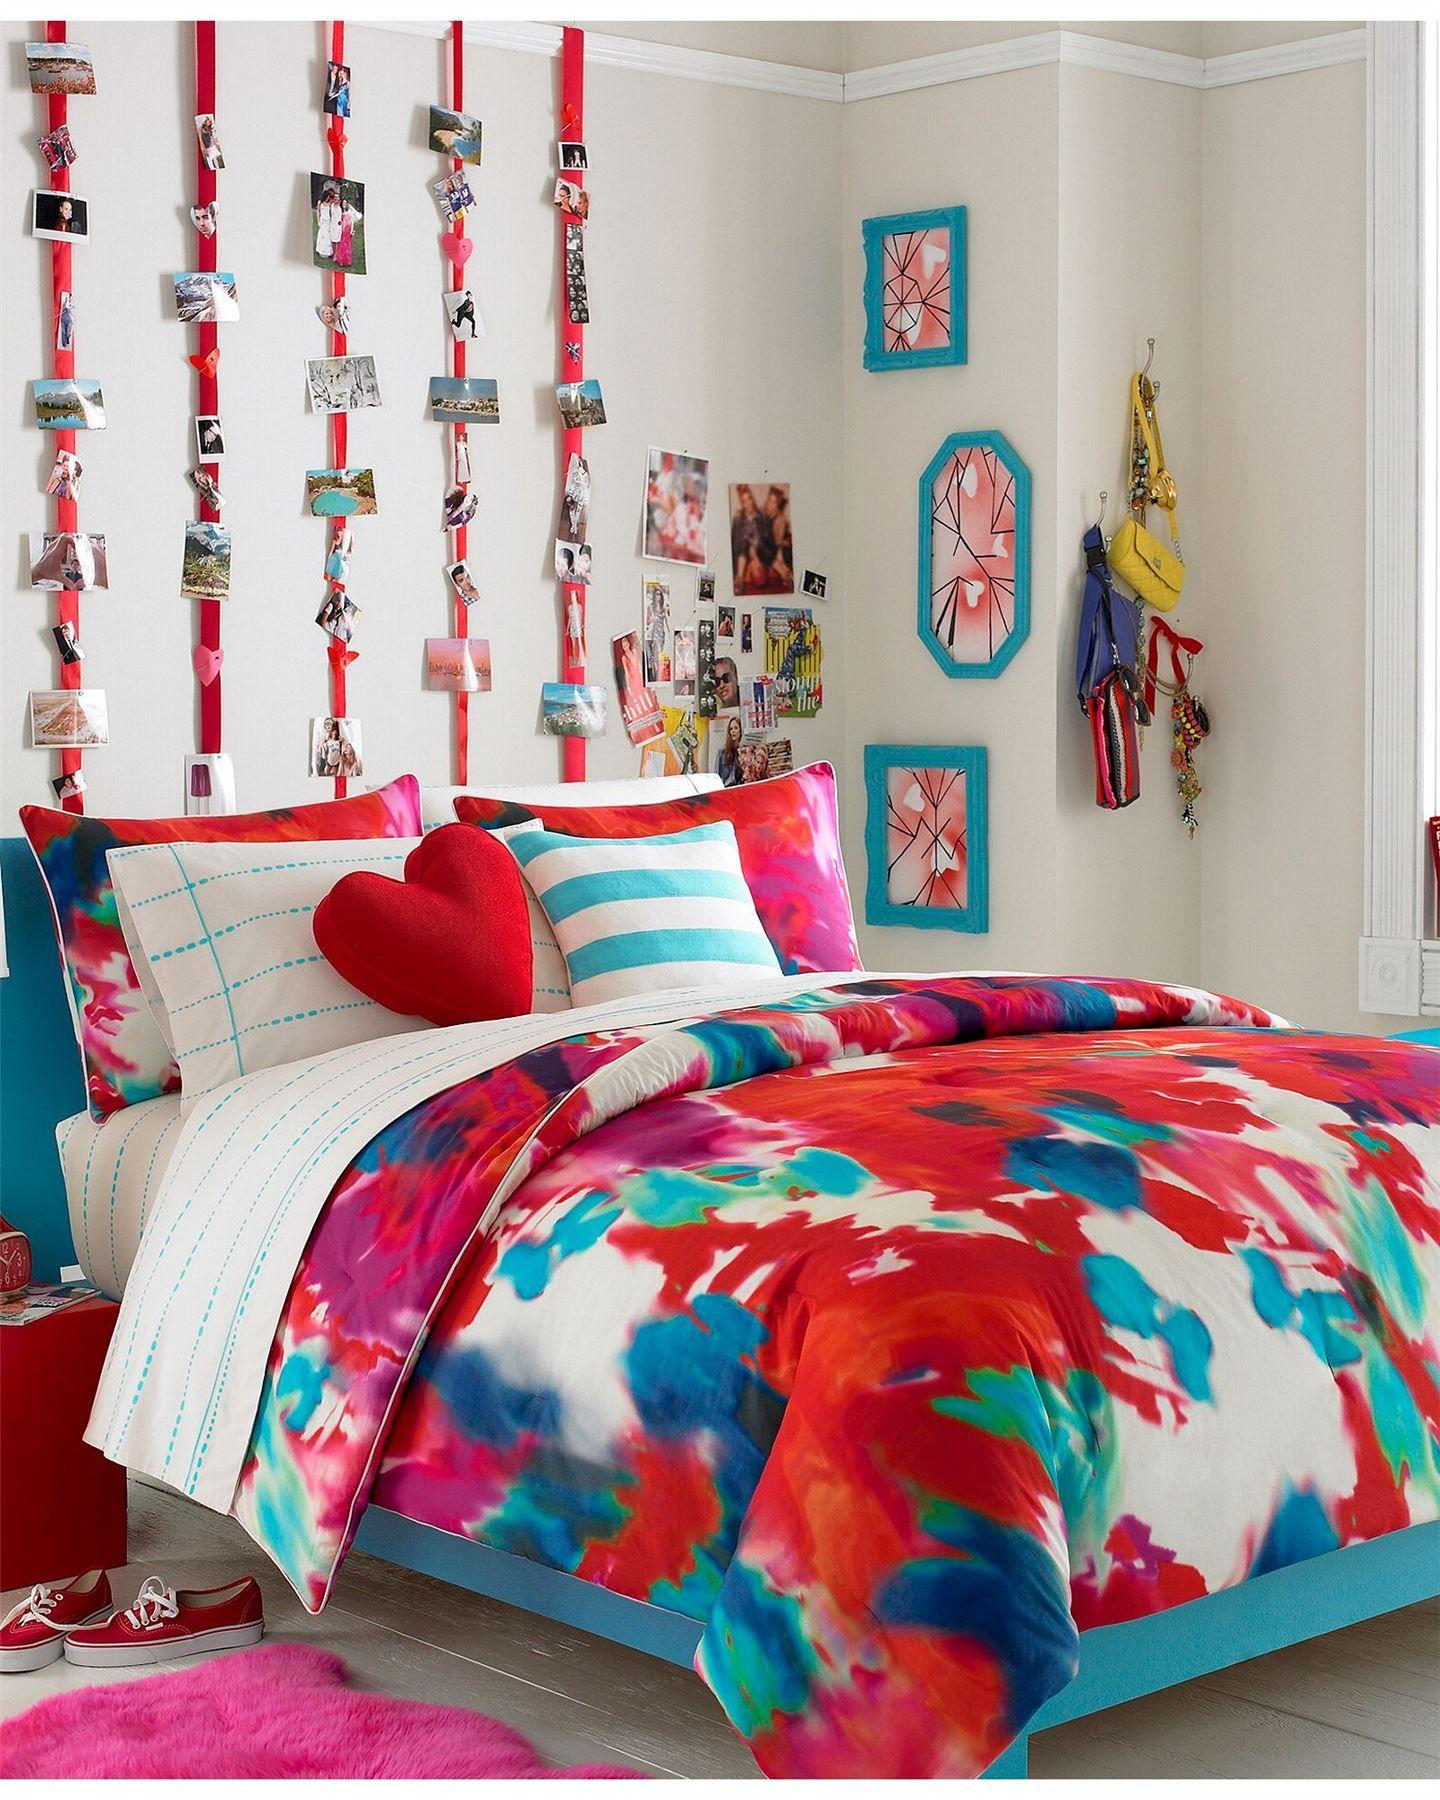 Teenage Girl Bedroom Ideas With Vogue Bedding Bedding ...